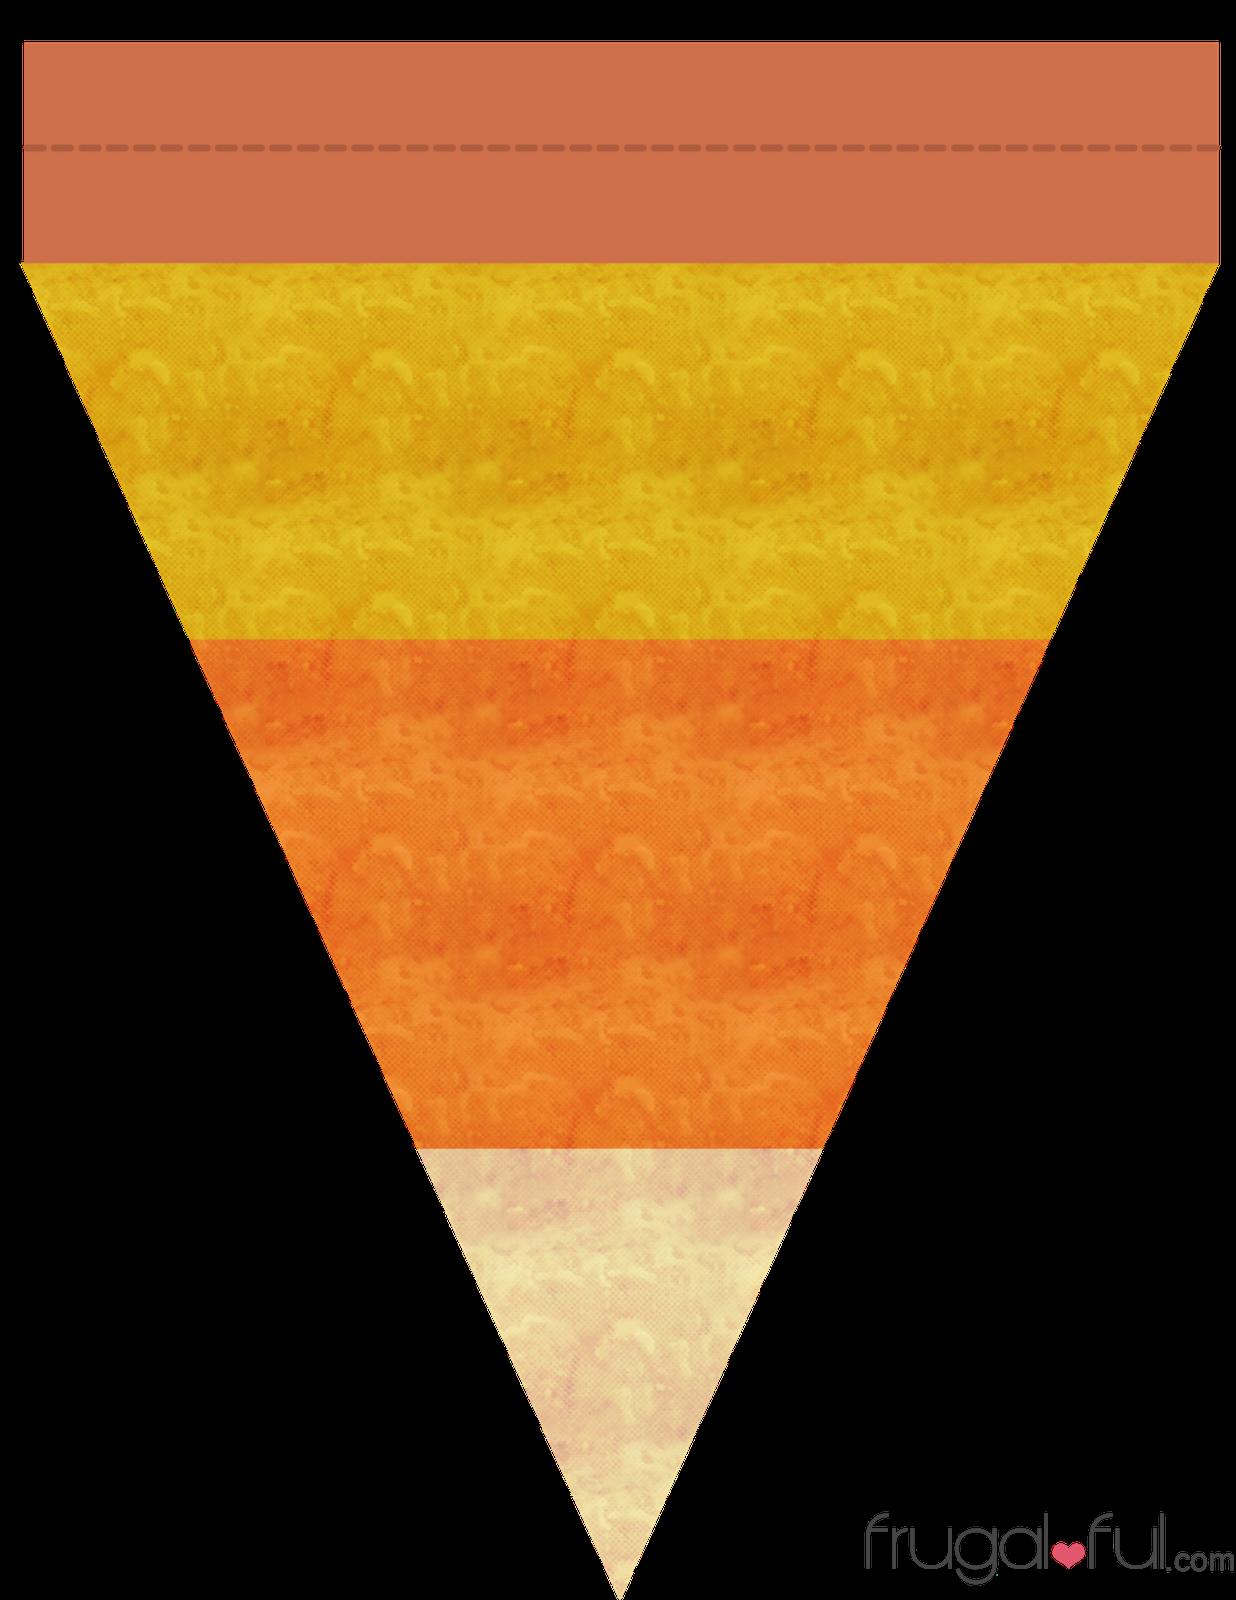 diy free printable halloween triangle banner template frugalfulcom